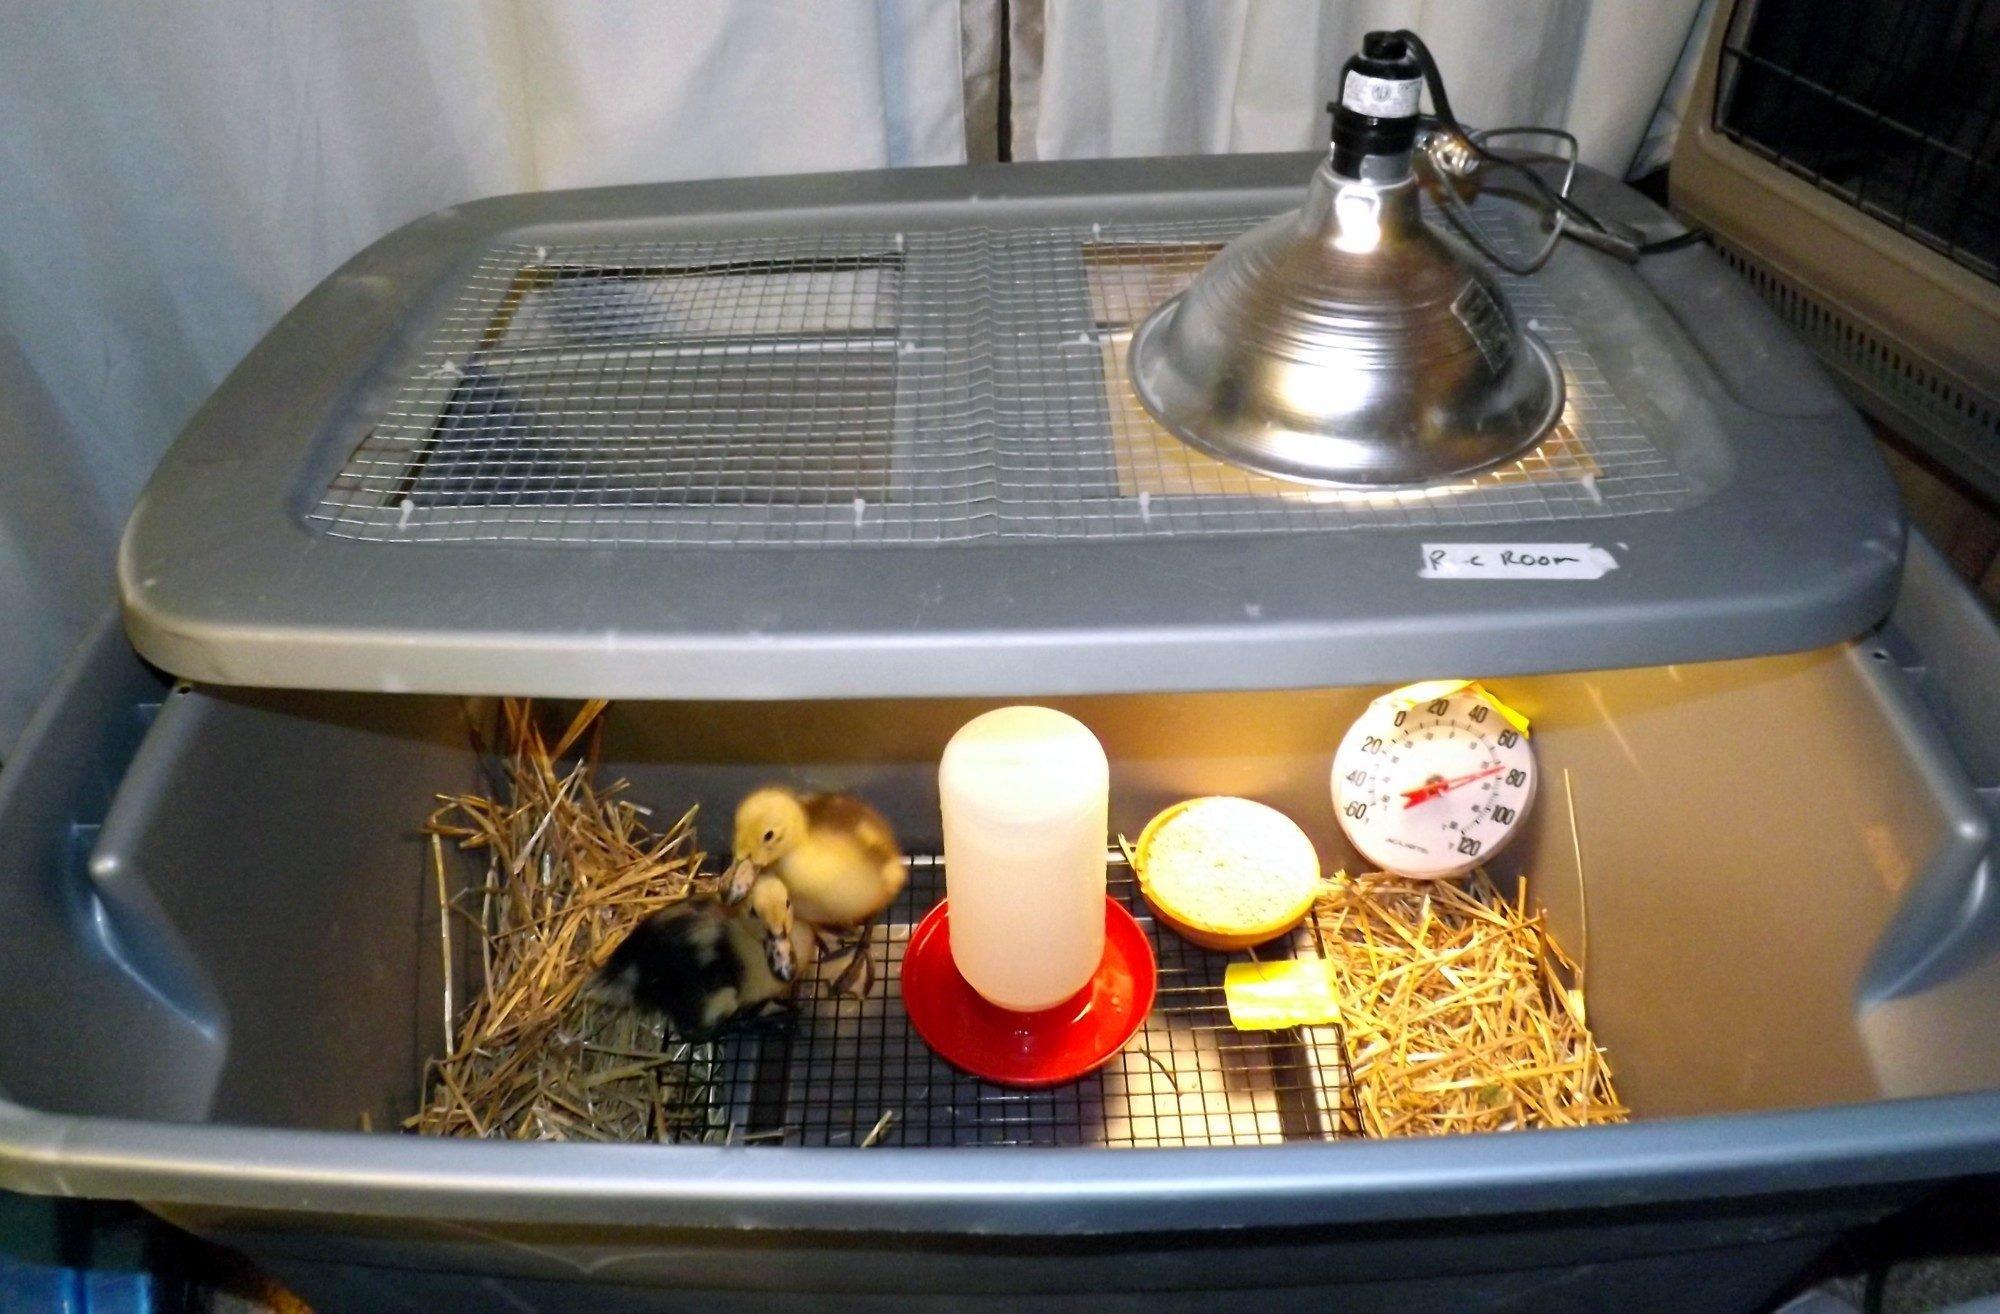 duckling care brooder ideas backyard chickens community. Black Bedroom Furniture Sets. Home Design Ideas